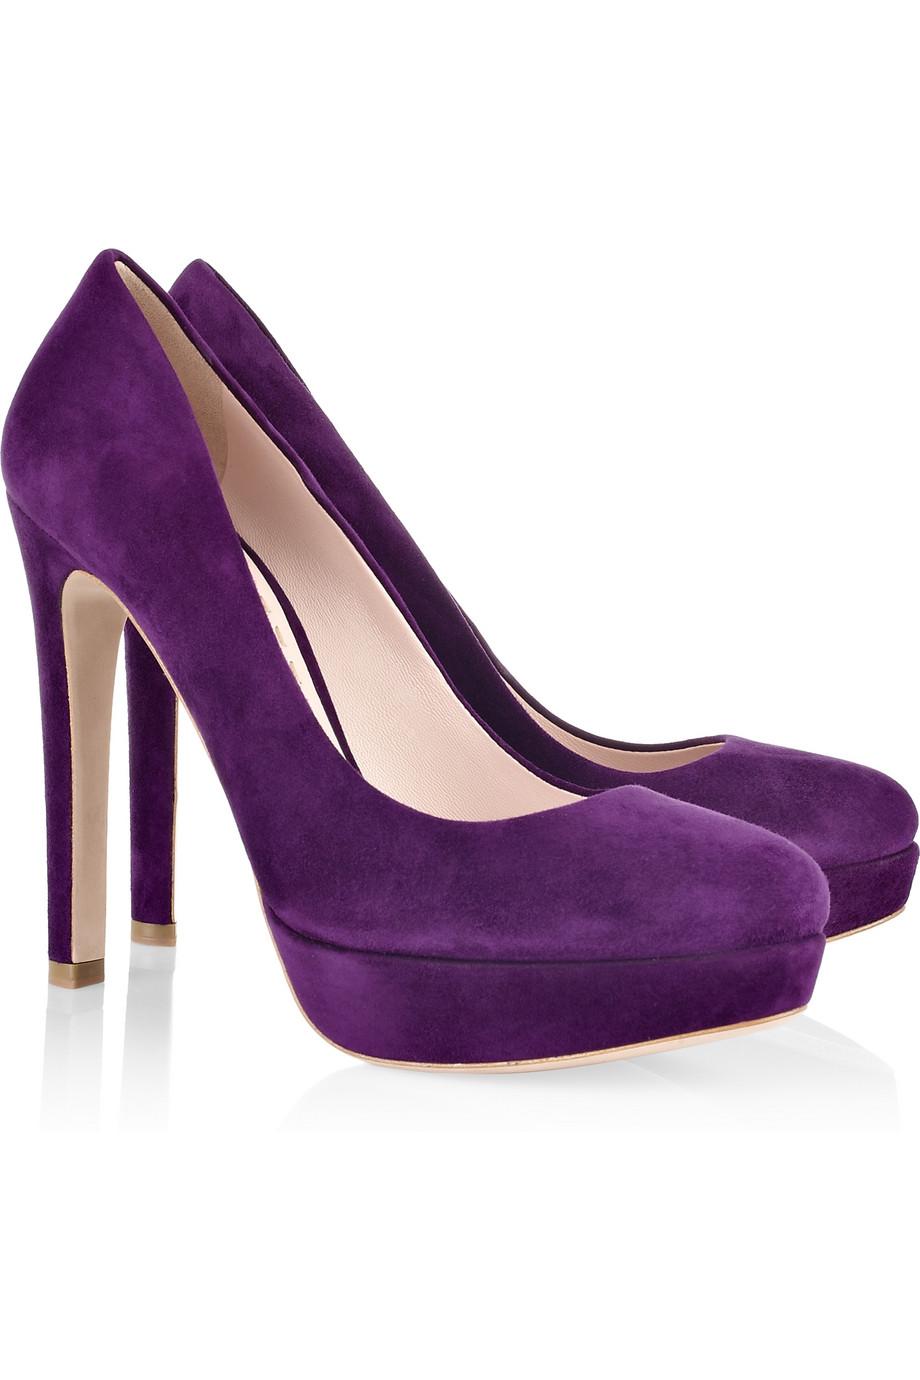 Suede Purple Heels